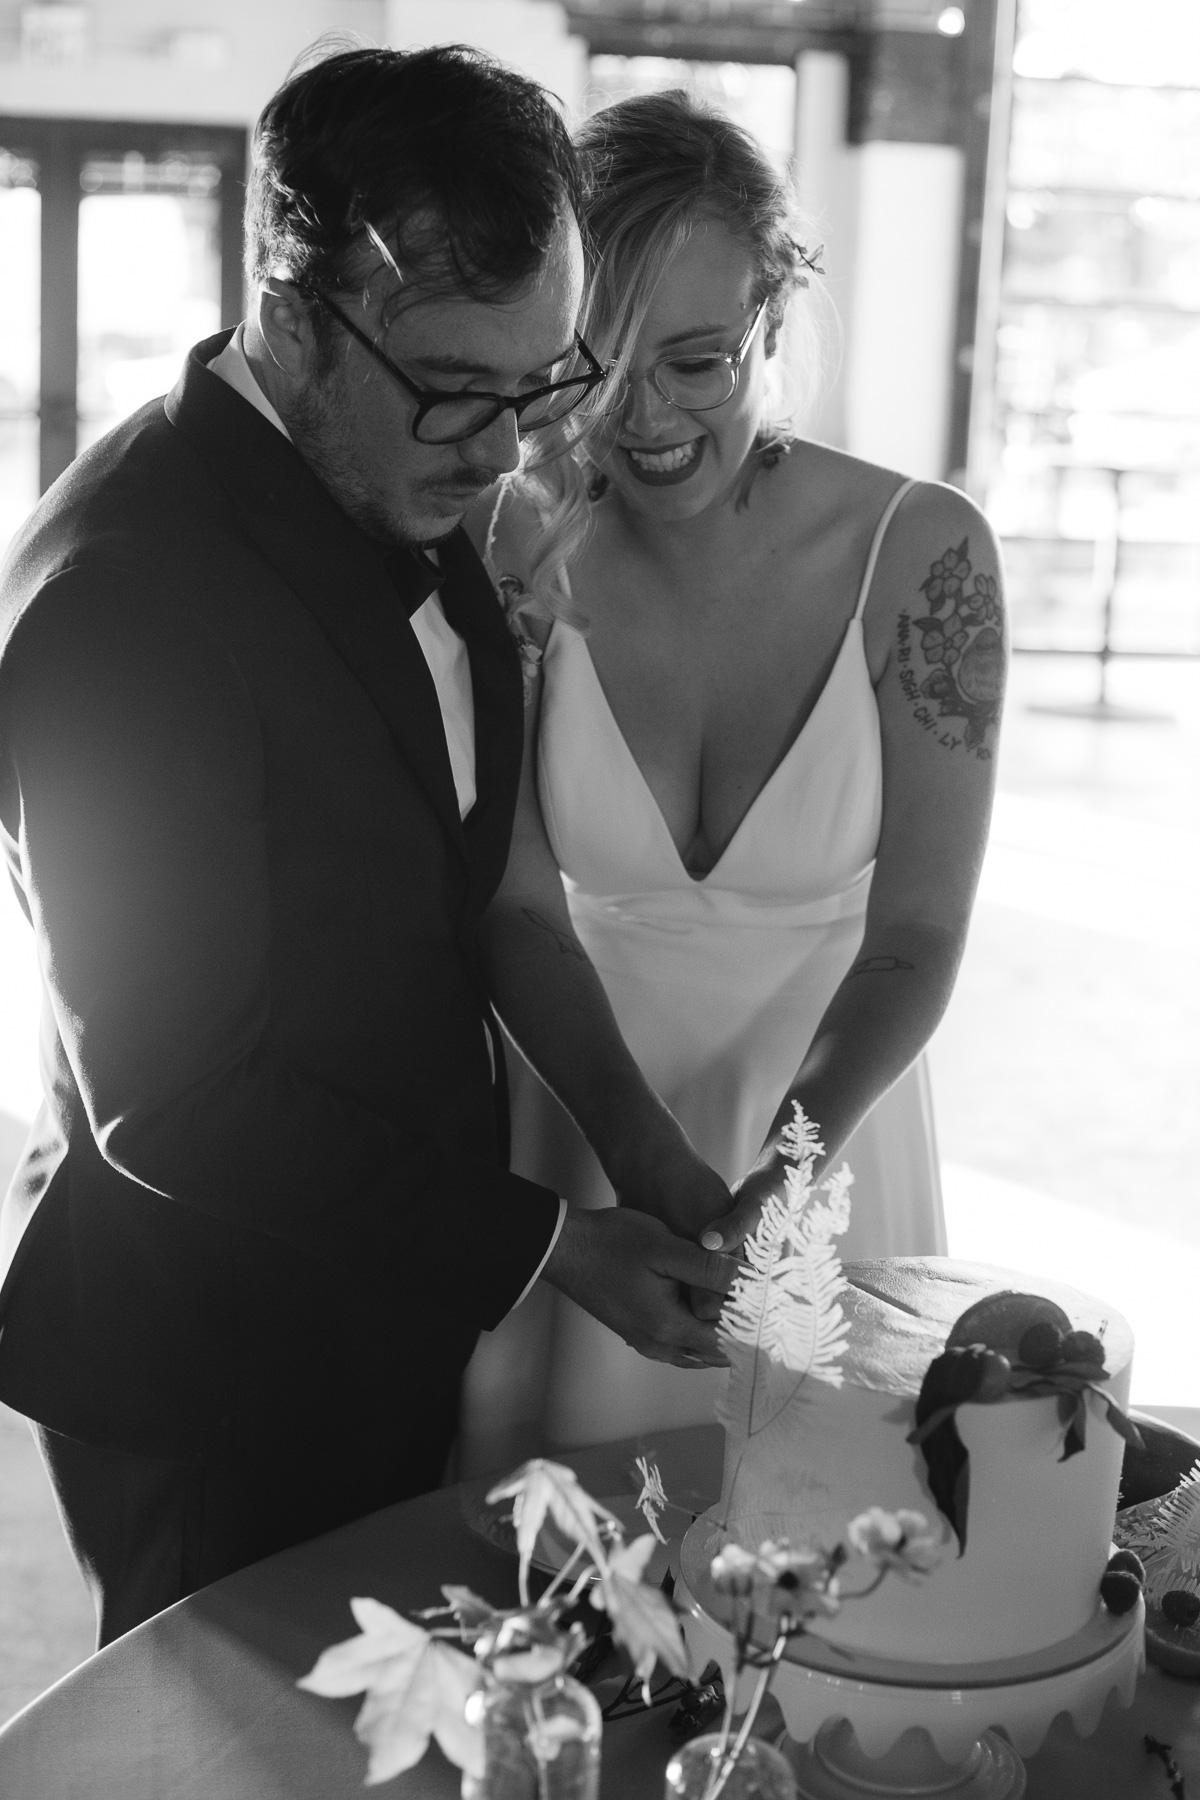 enowen-wedding-photography-mike-anna-suffolk-punch-charlotte (58 of 78).jpg